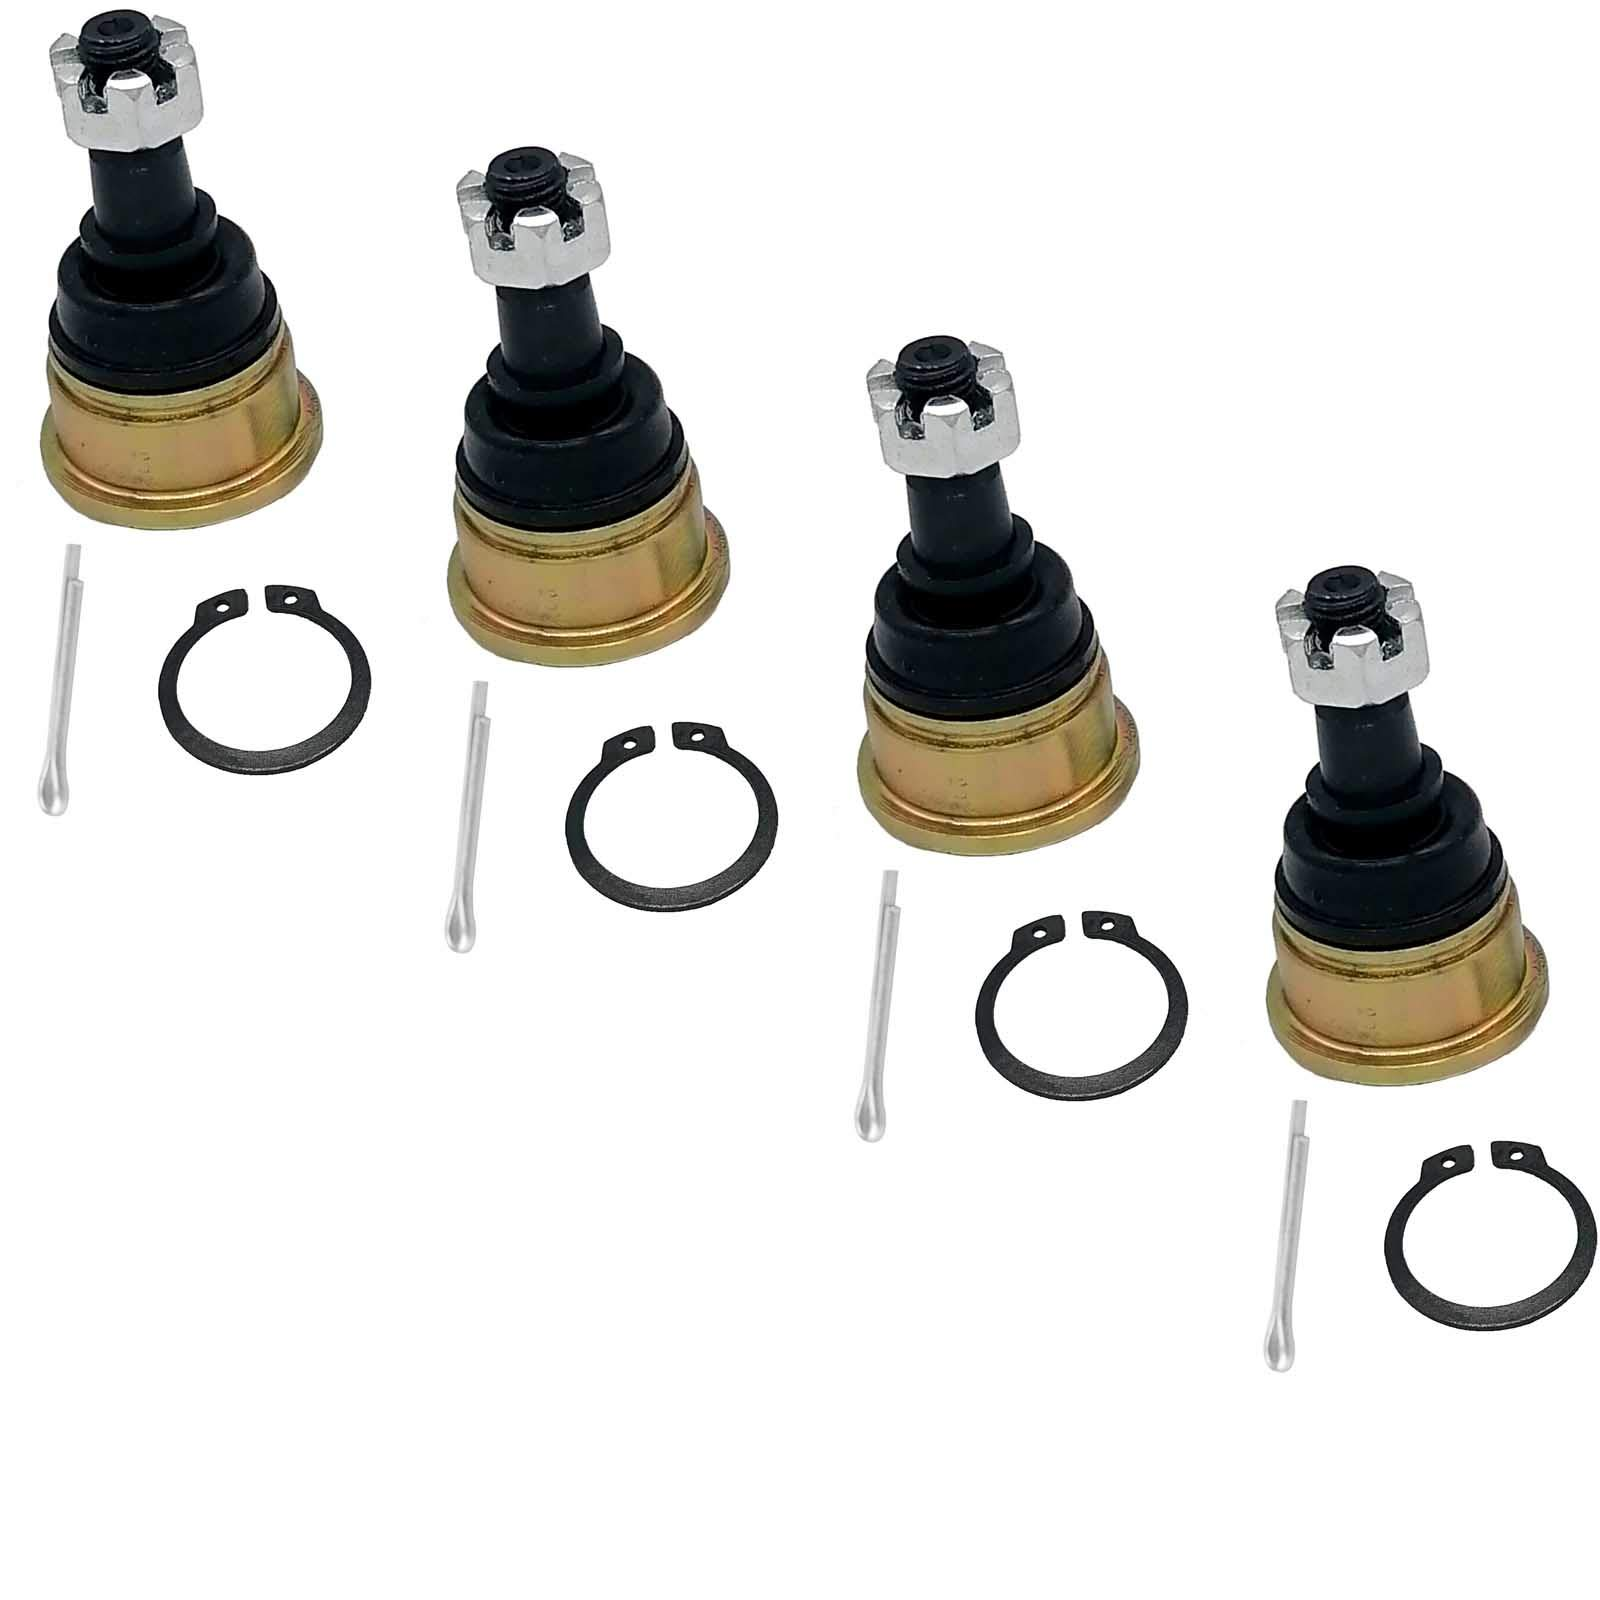 GAOSHUN Ball Joint for Yamaha 5LP-23579-00-00 Raptor 700 YFM700 Suzuki 52440-21812-YD8 Quadsport Z250 Upper Lower 4 Pack